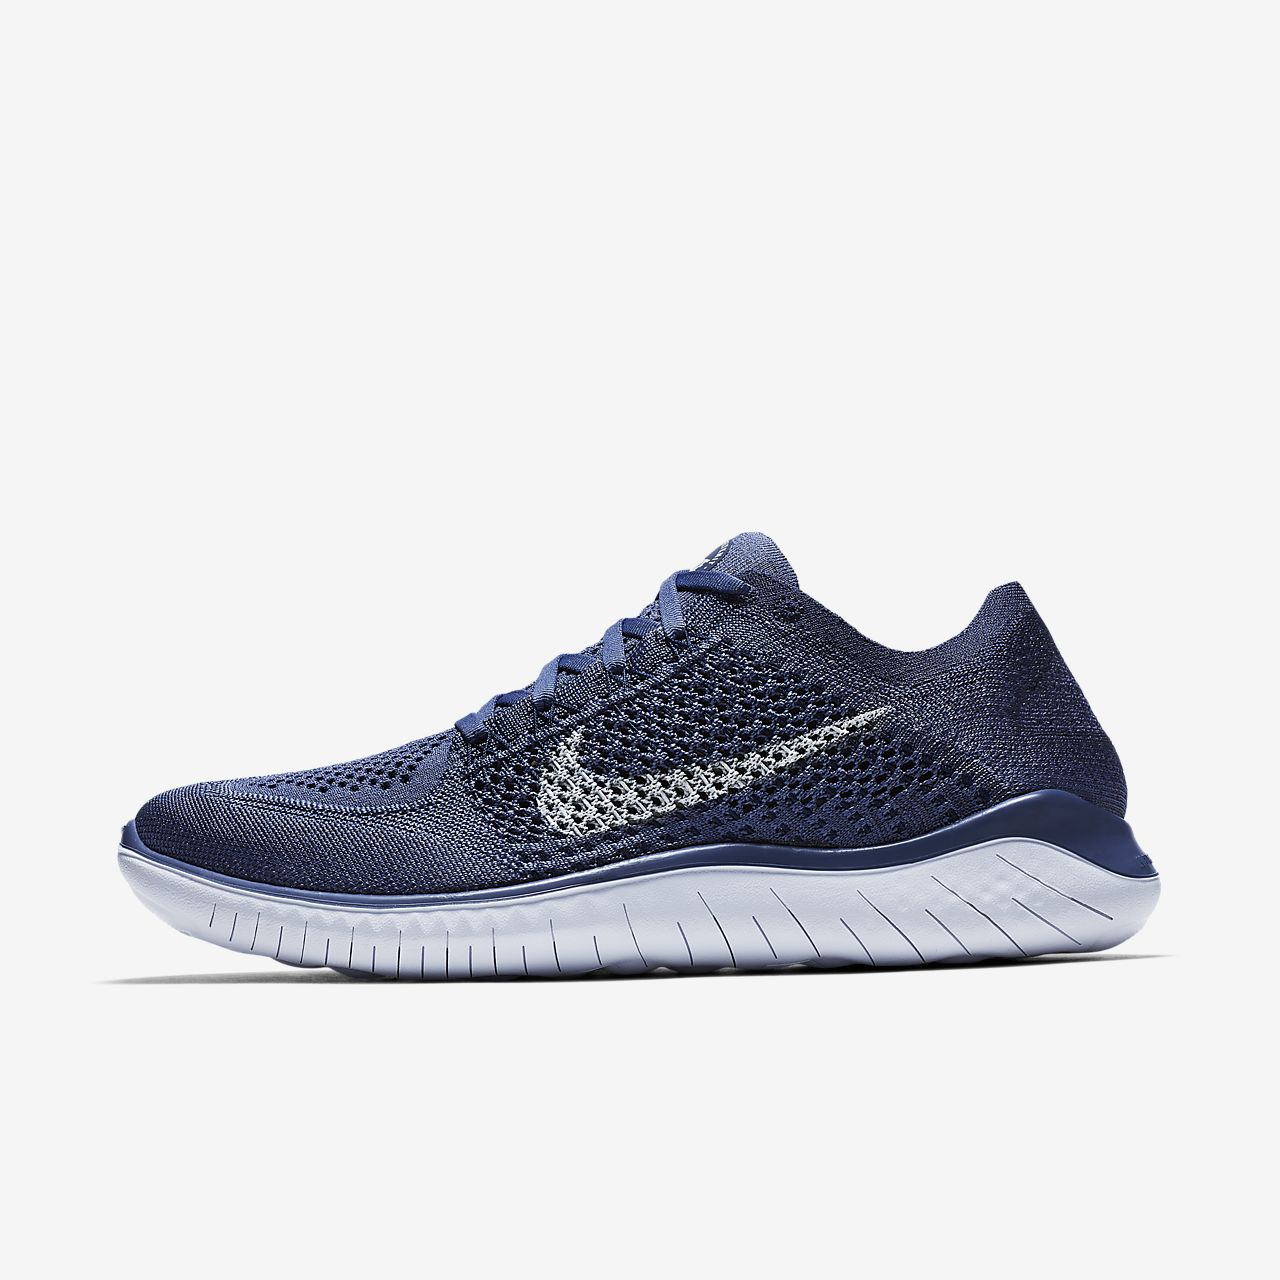 Nike Free RN Flyknit 2018 Zapatillas de running - Hombre